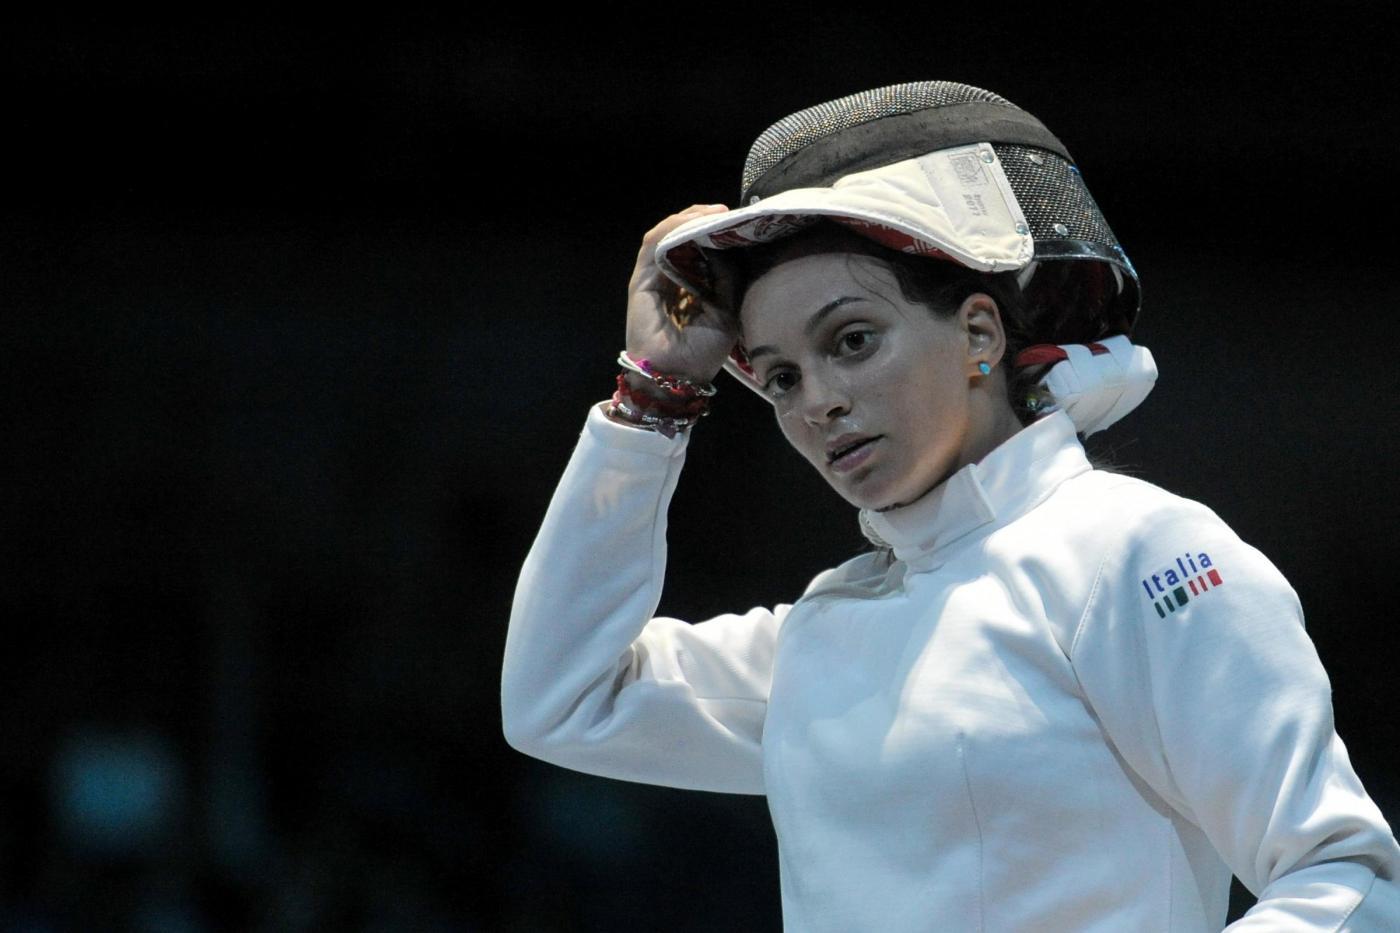 Olimpiadi 2016: Rossella Fiamingo argento nella spada femminile